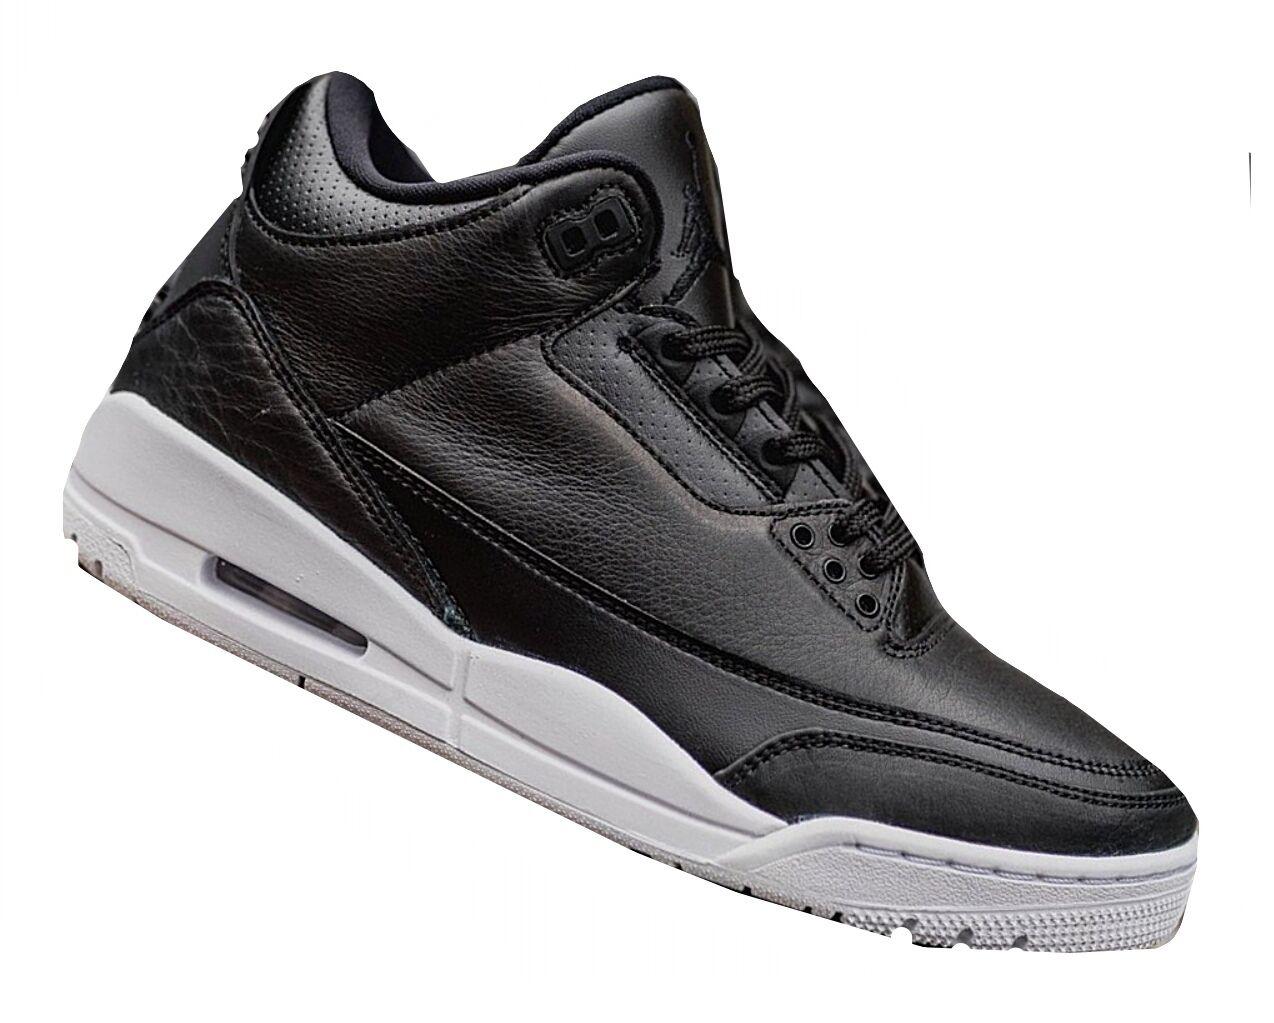 Nike homme running AIR Jordan 3 Originals running homme trainers 136064-020-us uk 11 new boxed 0e8ed6